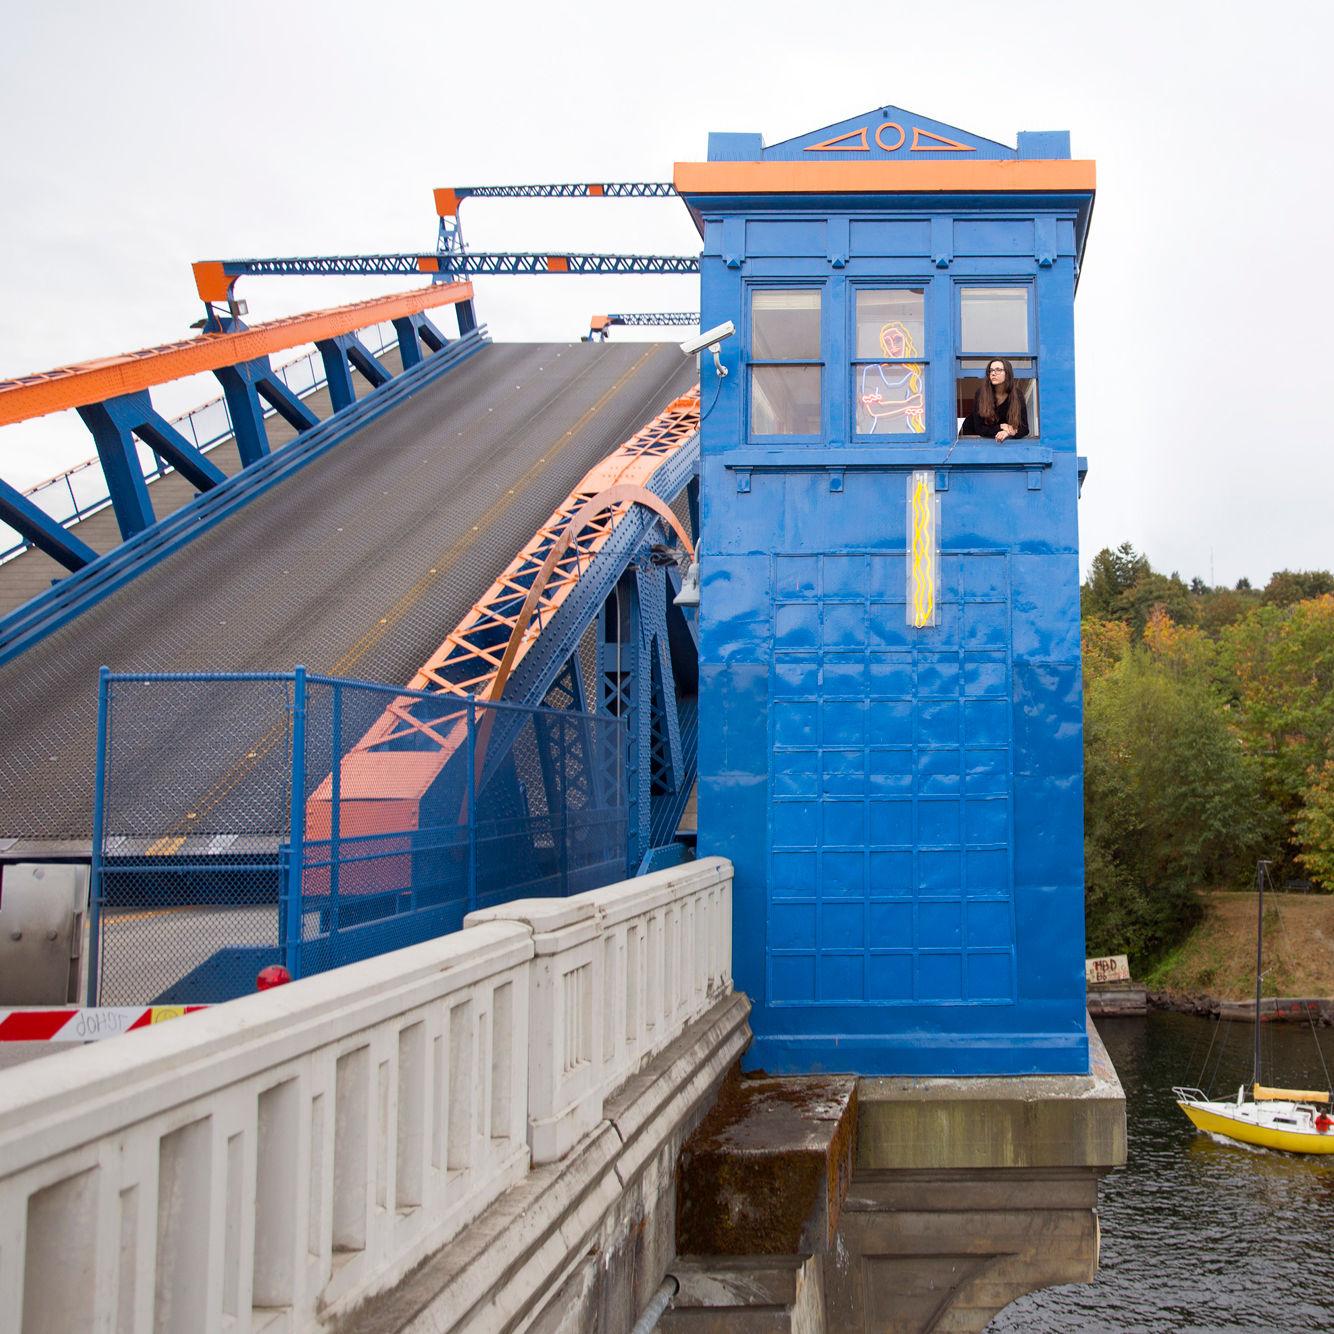 Fremont bridge poet fr 01b mautrd